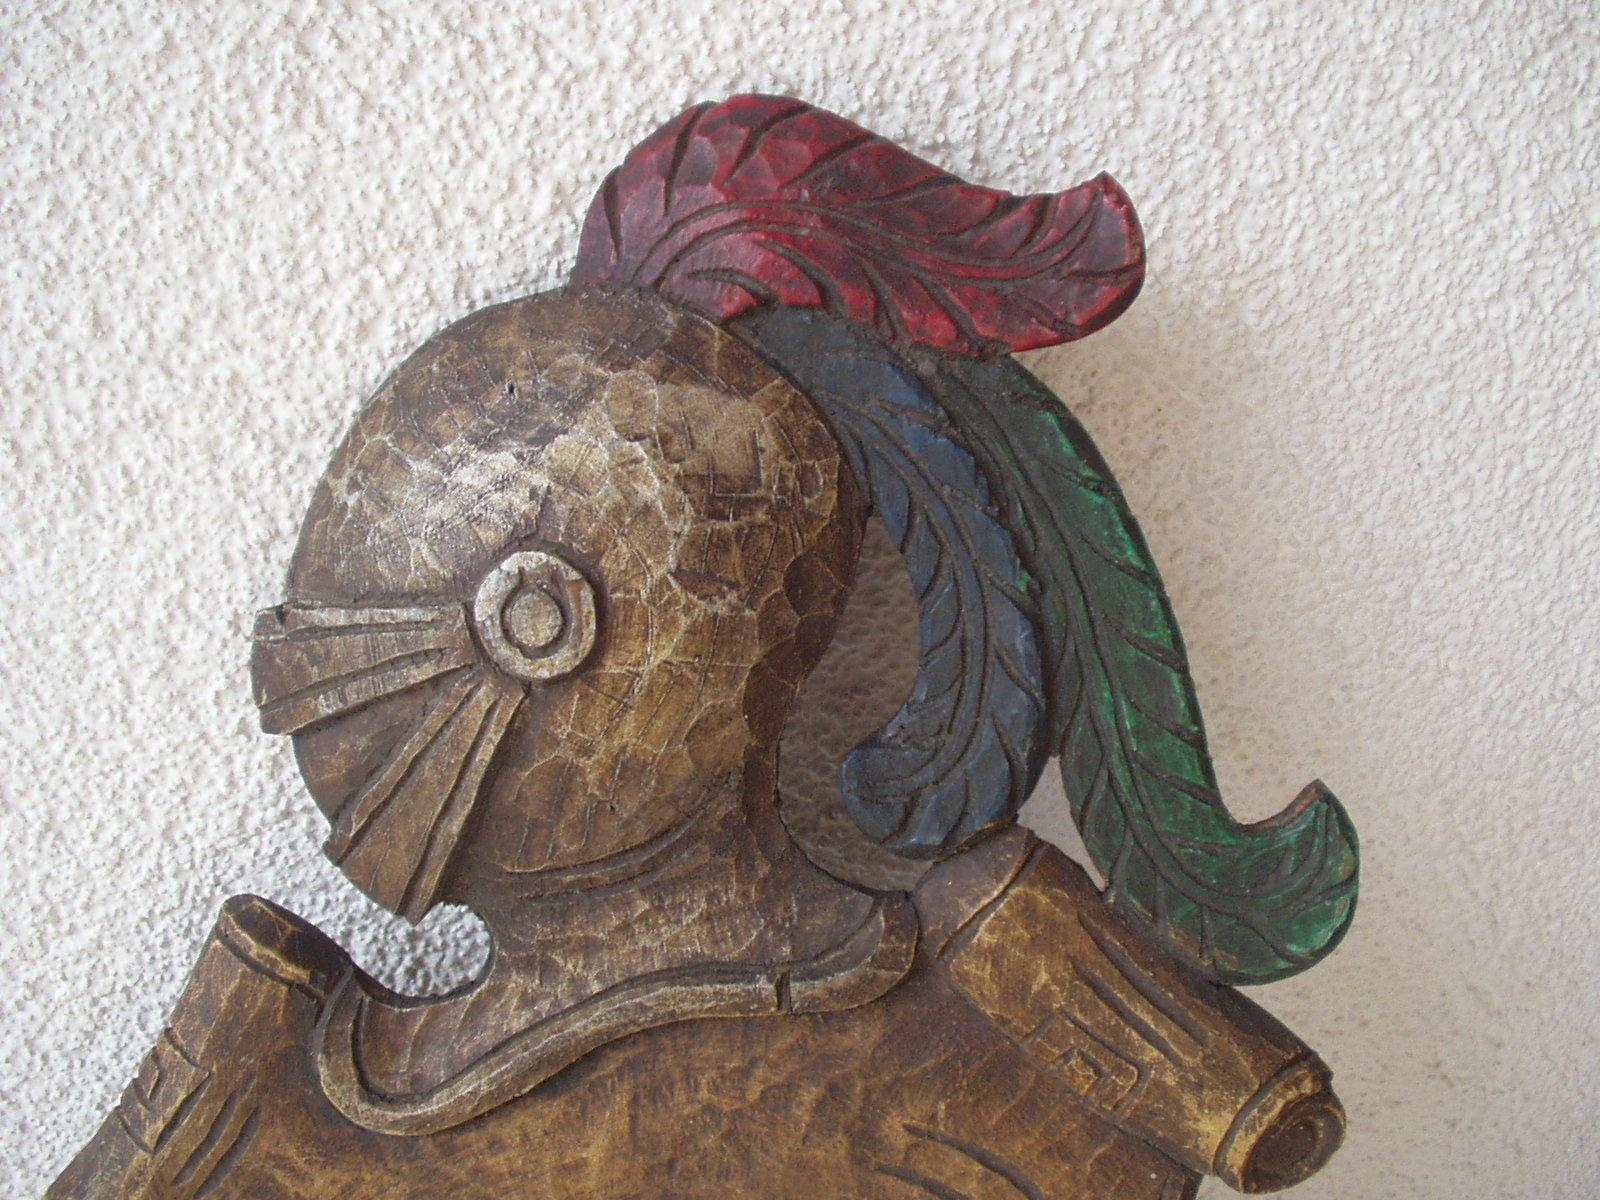 Antique 1900 German black forest carved wood shield medieval knight shop sign image 2